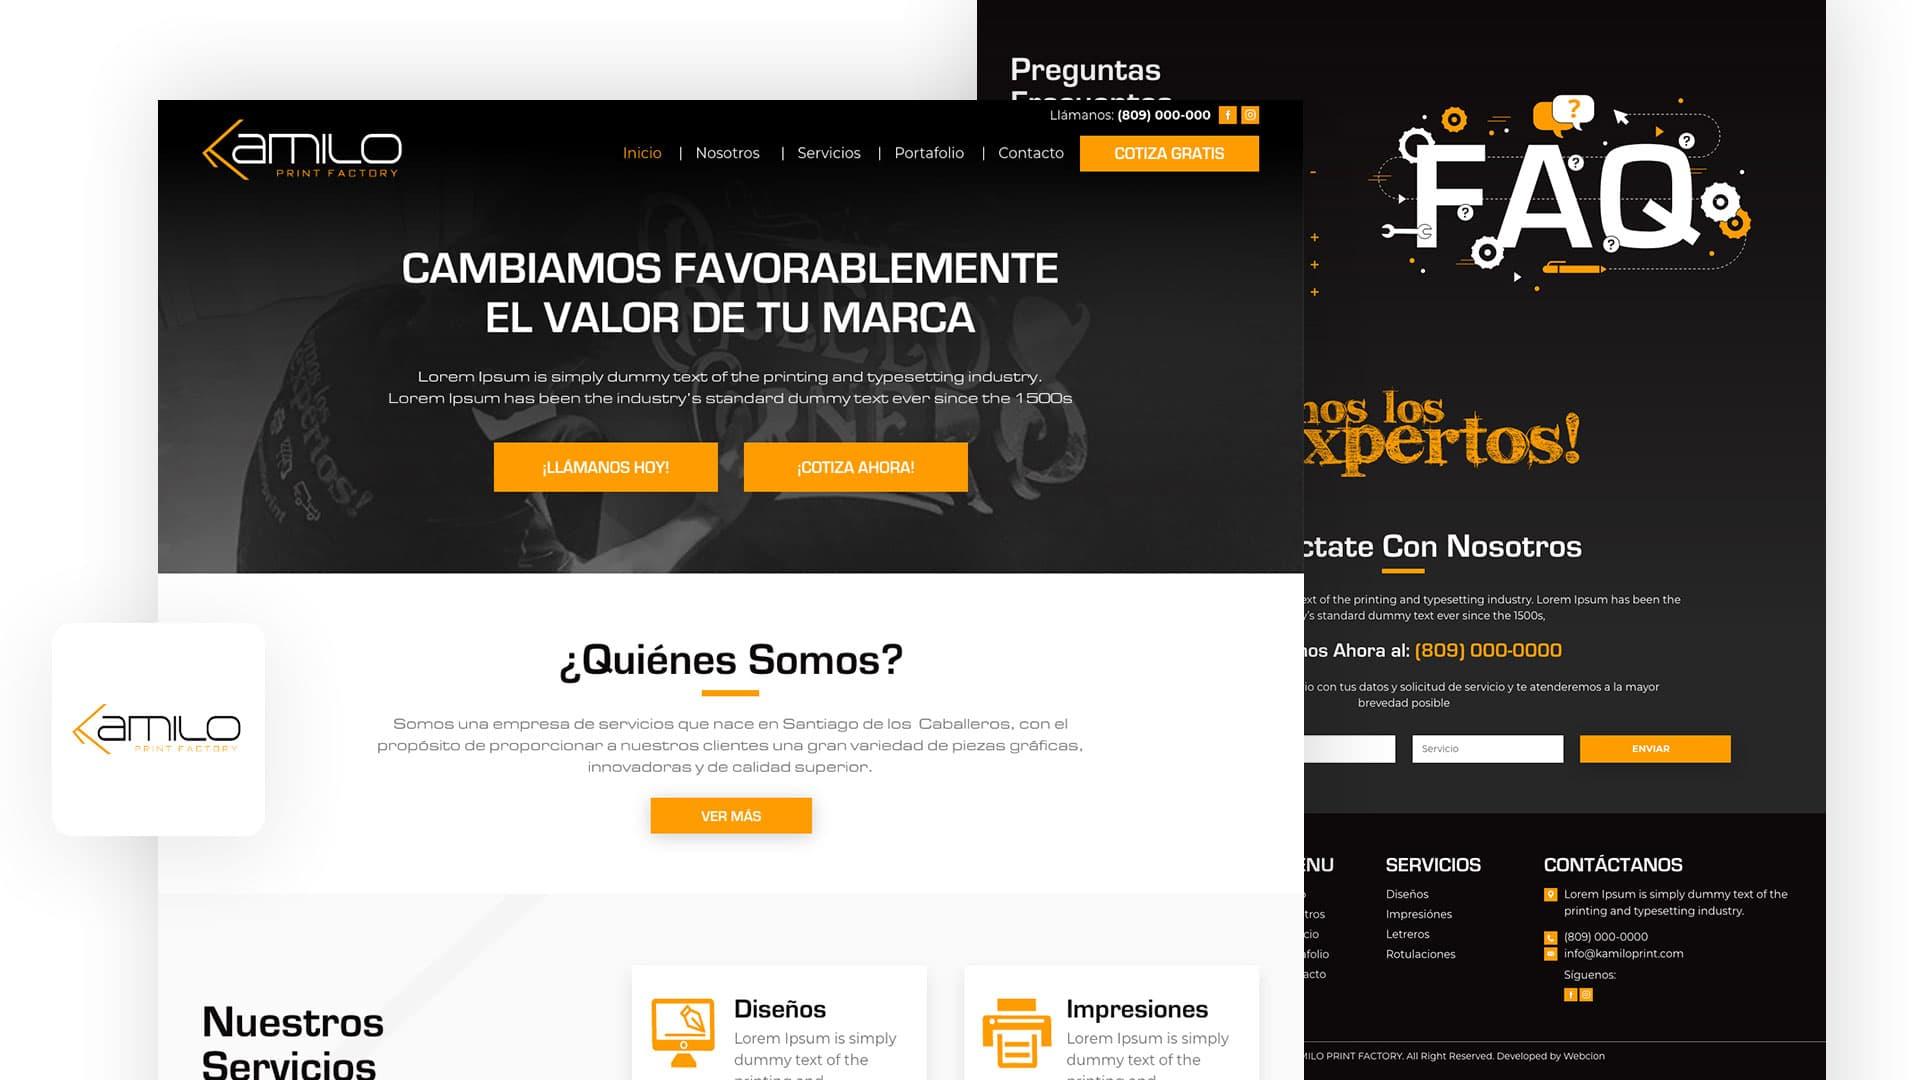 Kamilo Print Factory, imprenta, website, pagina web, diseño, template, amarillo, negro